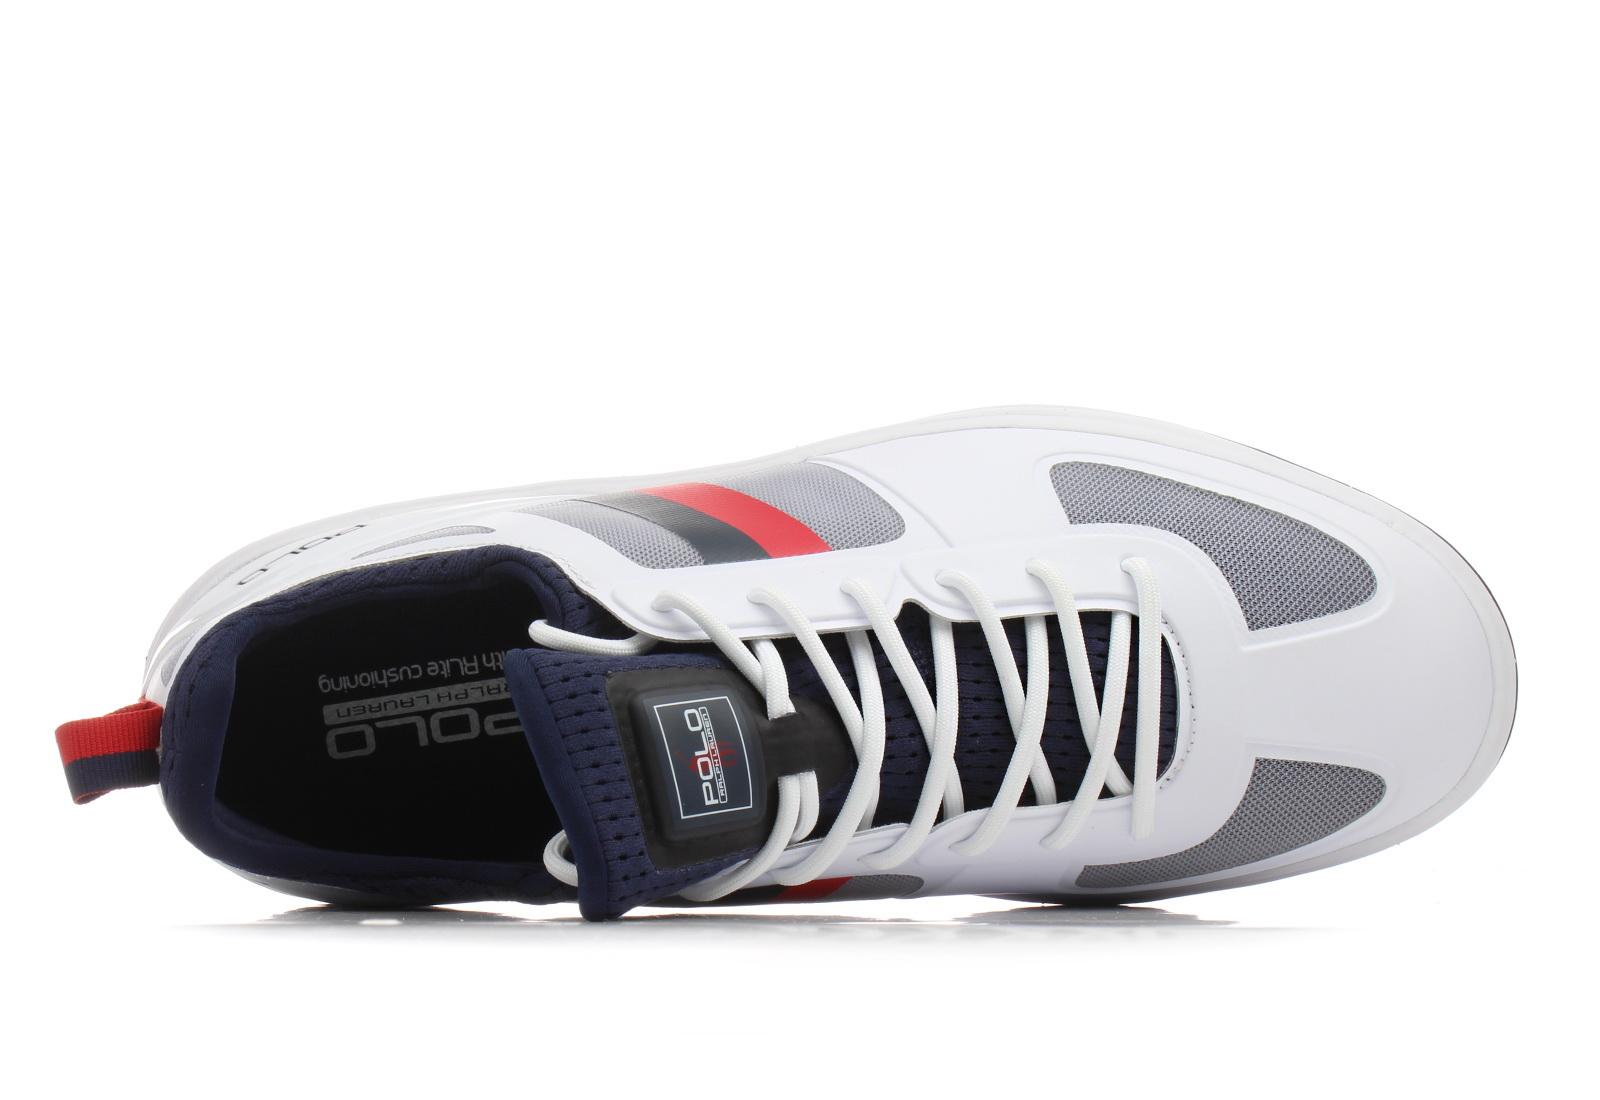 b9aee9f3b Polo Ralph Lauren Nízké Boty - Court 200 - 809669837007Značková obuv ...